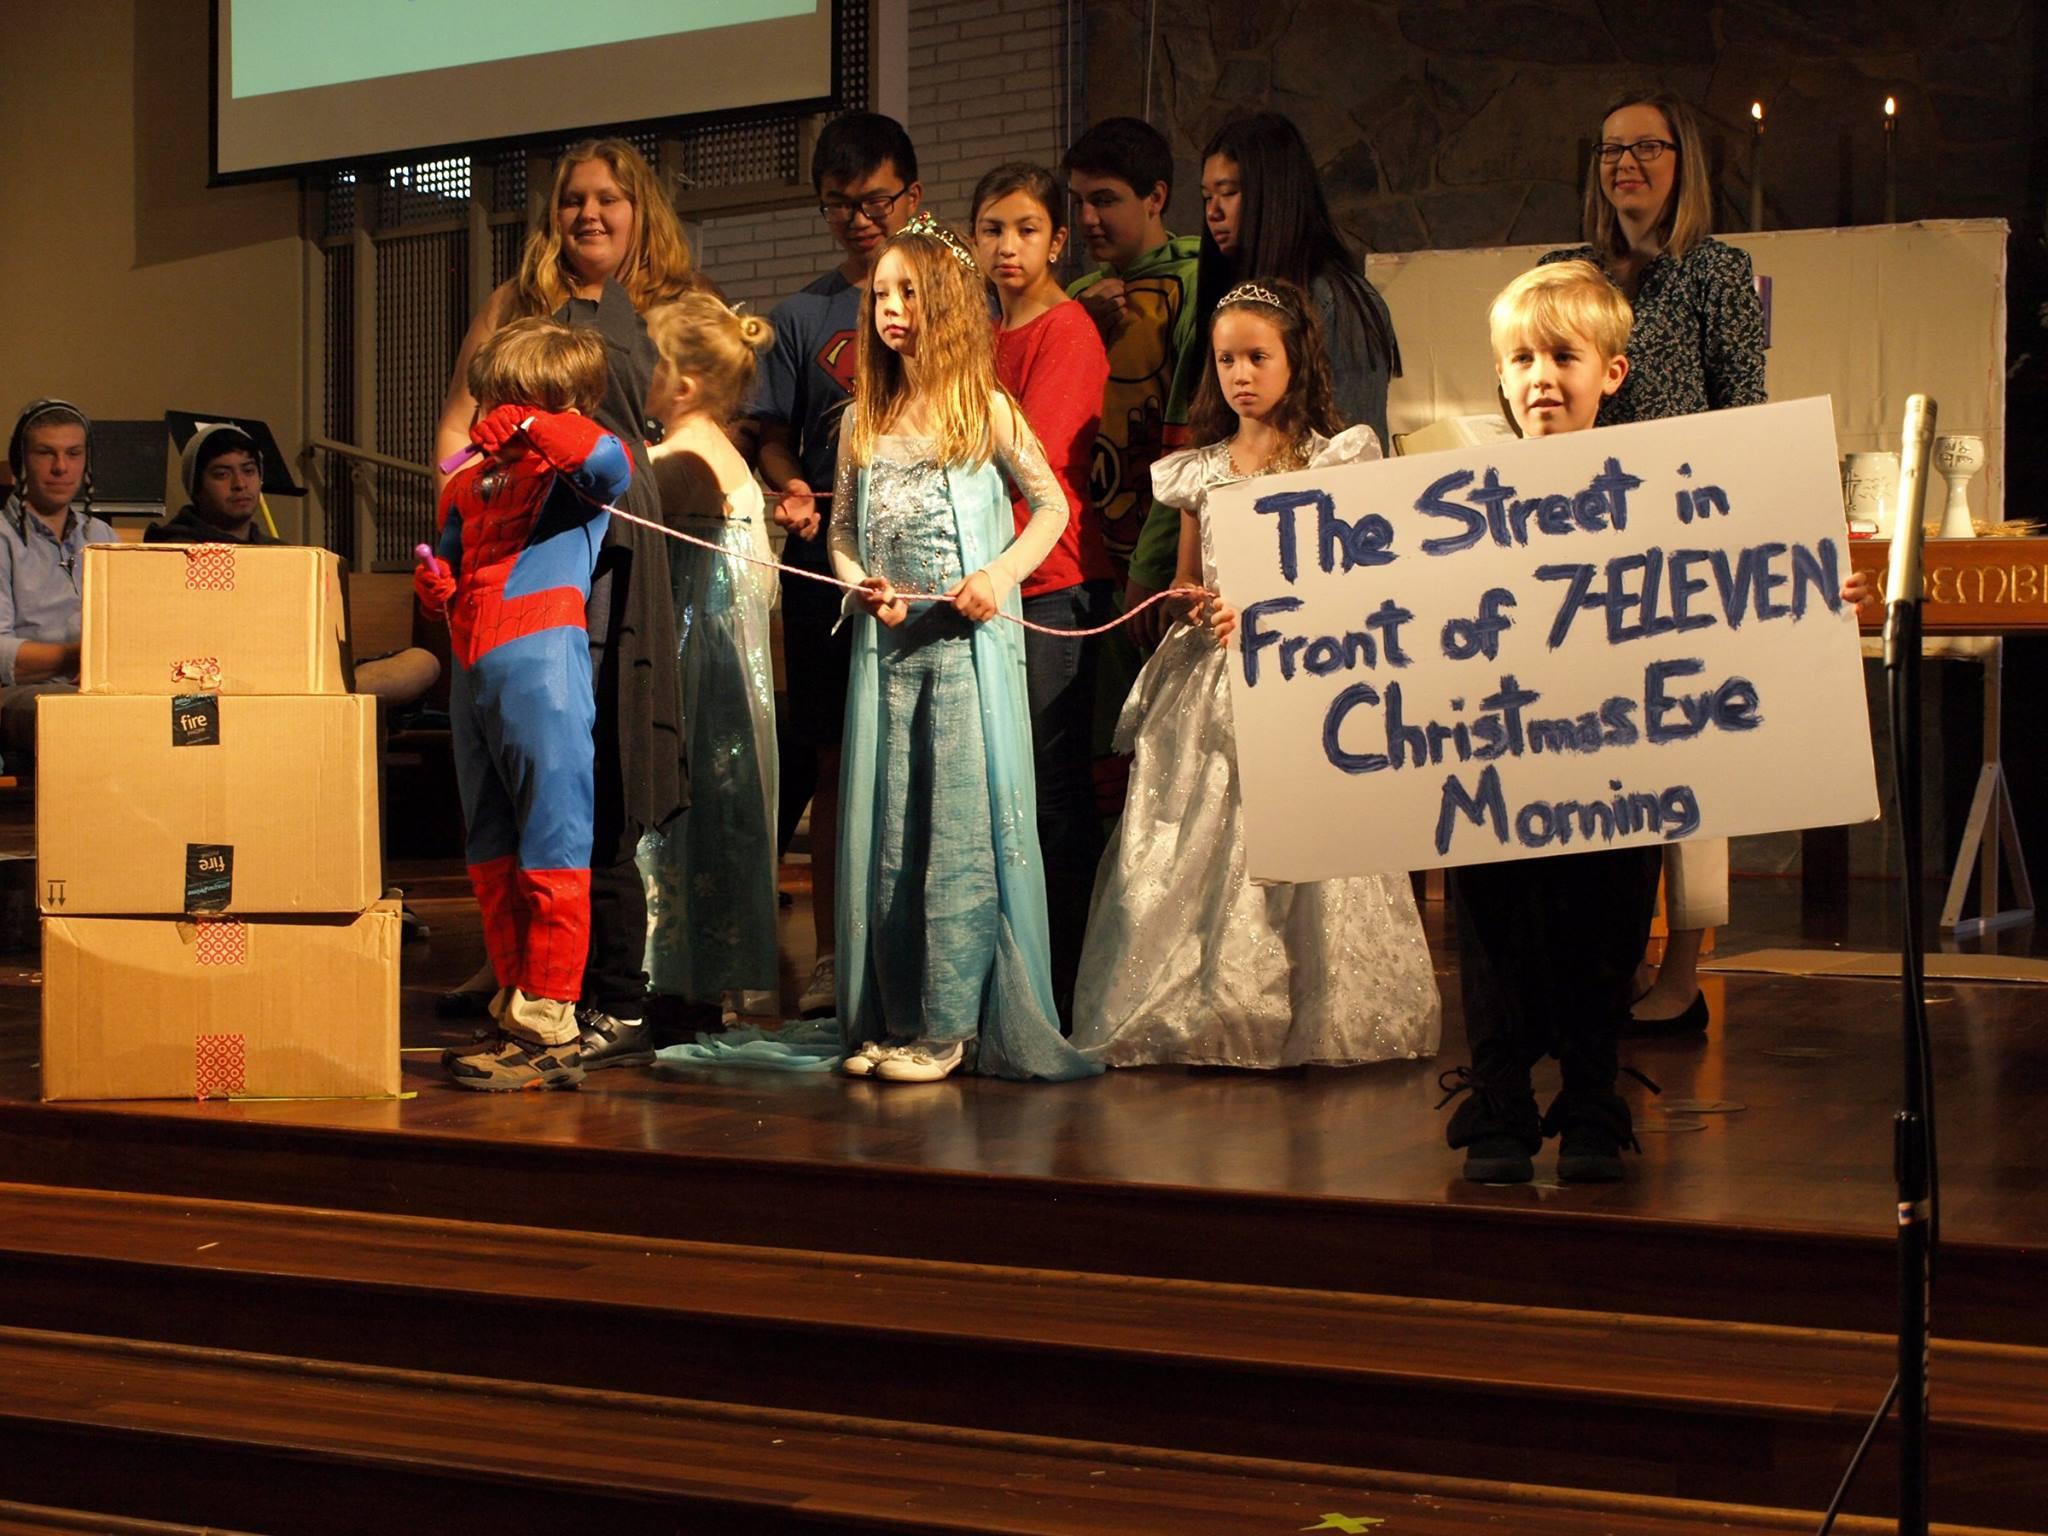 claremont-presbyterian-church-childrens-service.jpg